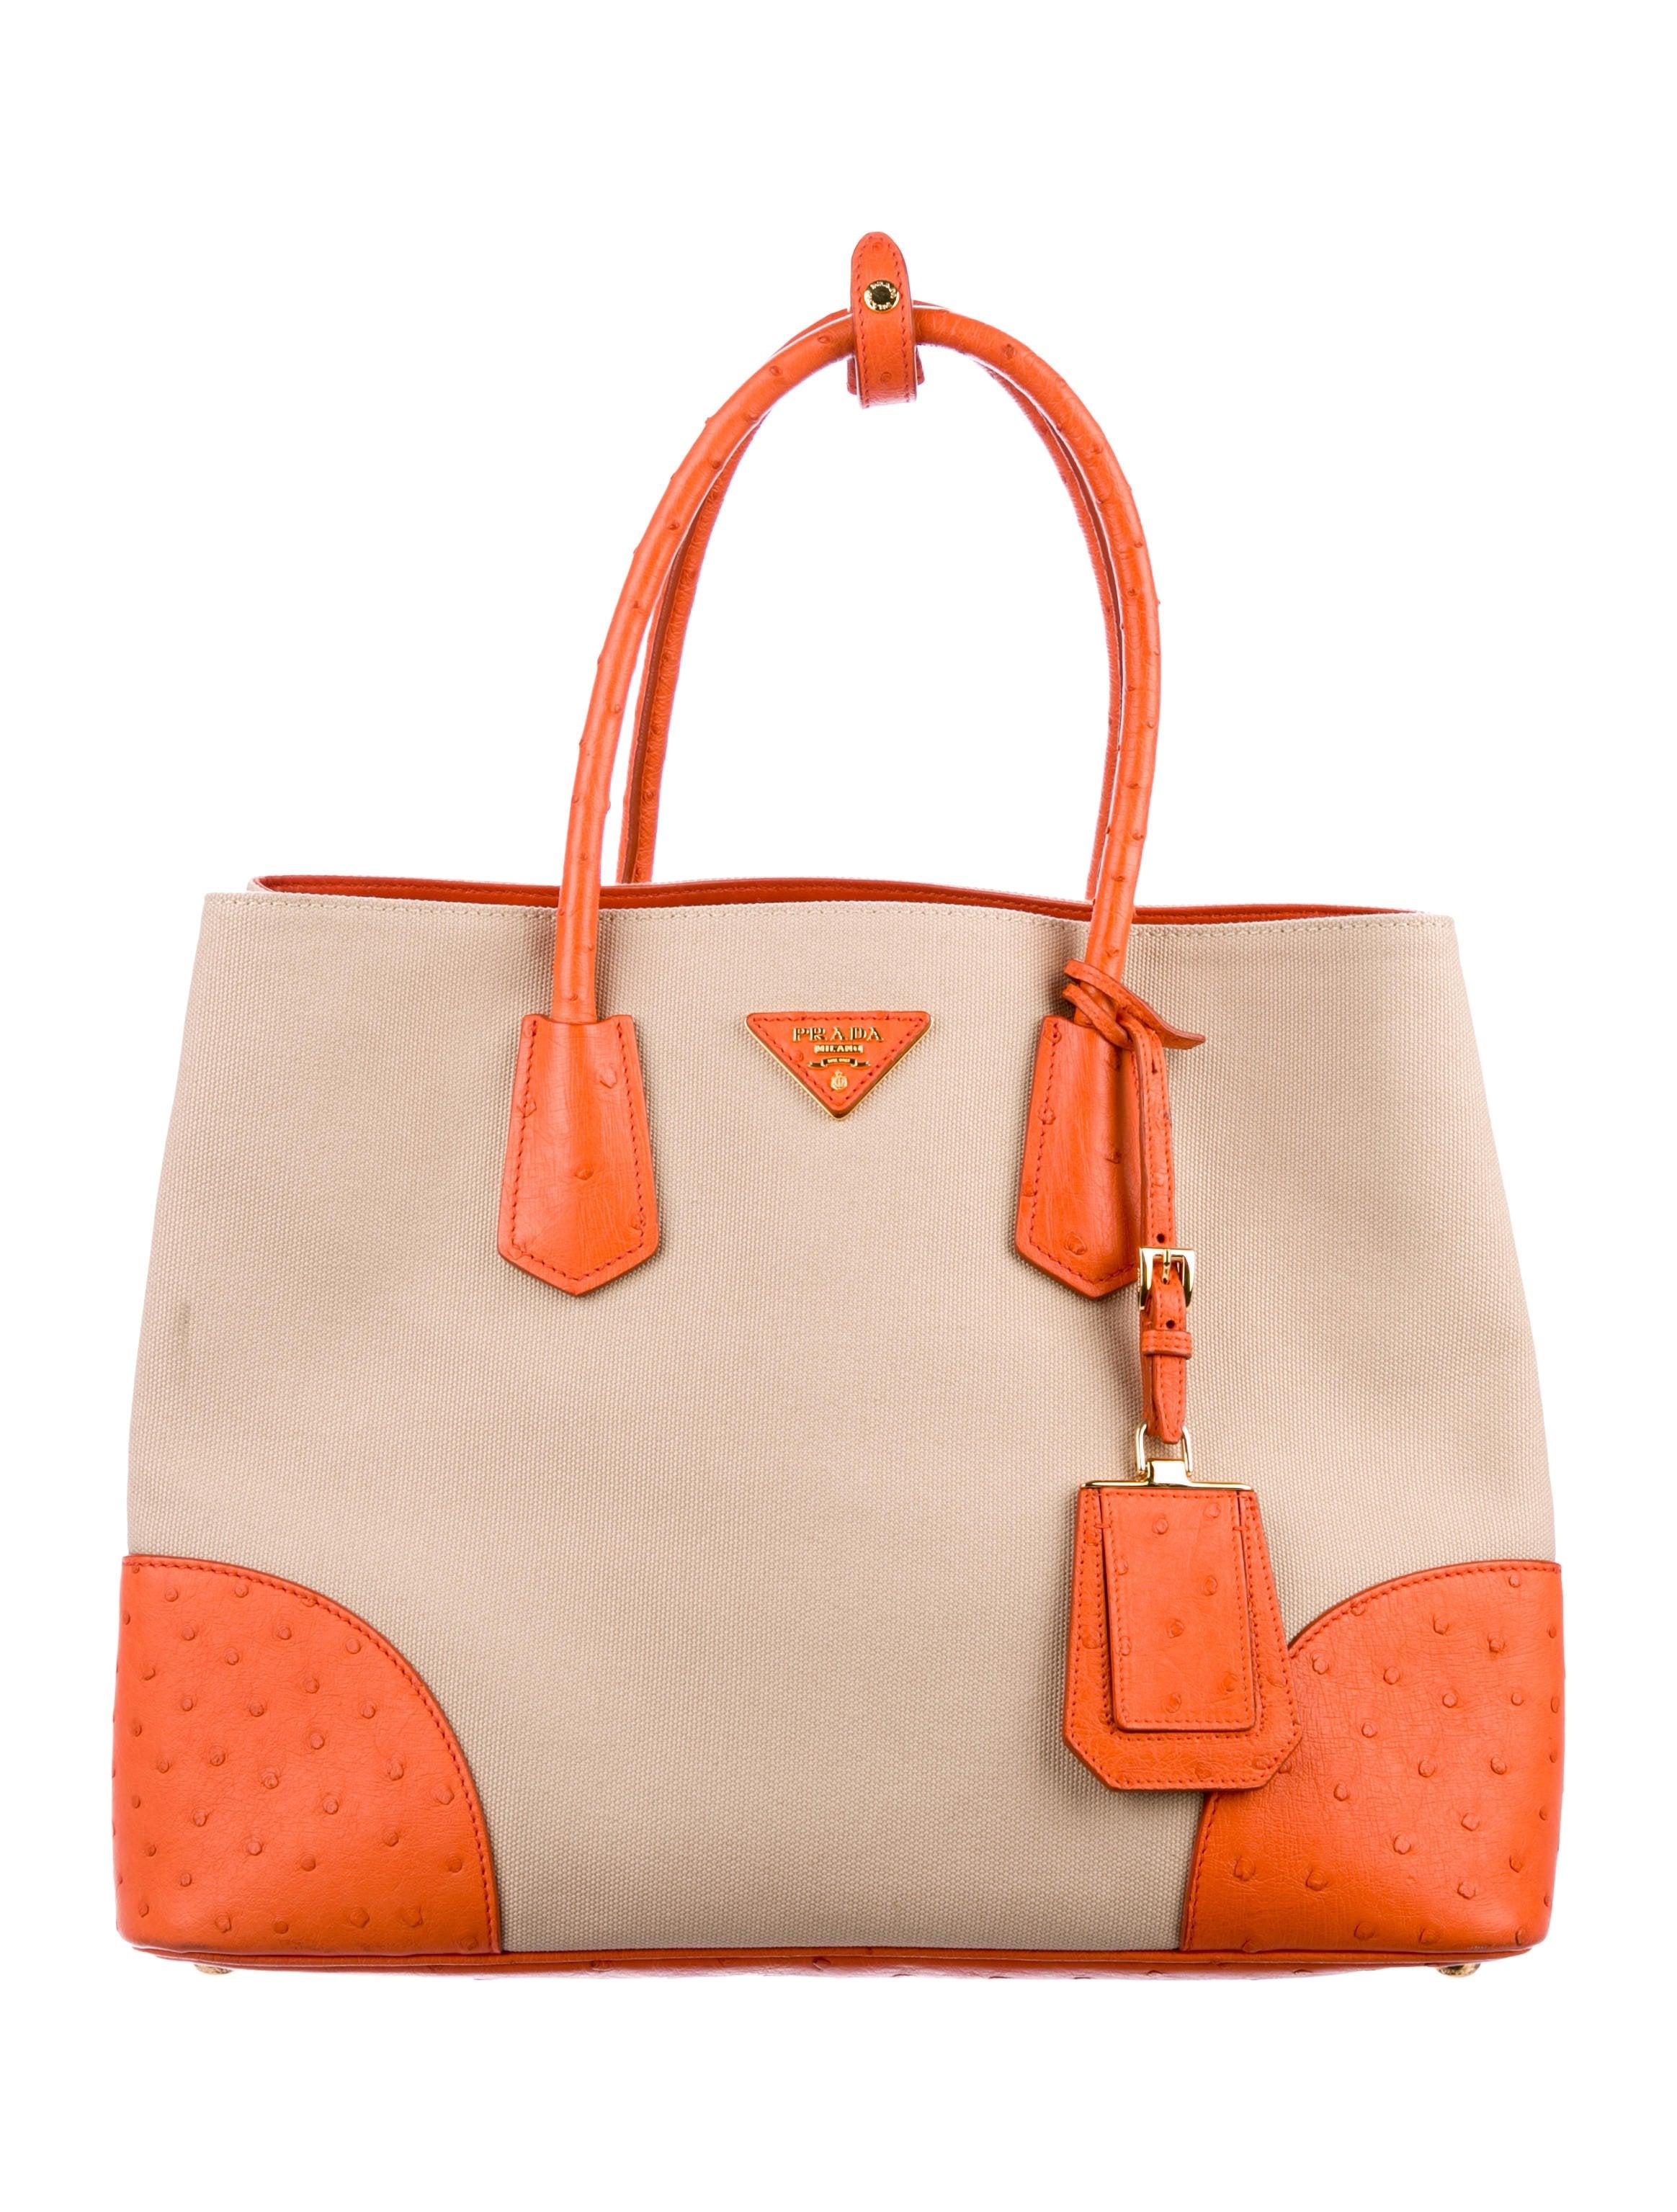 5ee4f31c682 Prada Ostrich-Trimmed Medium Double Tote - Handbags - PRA251293 ...